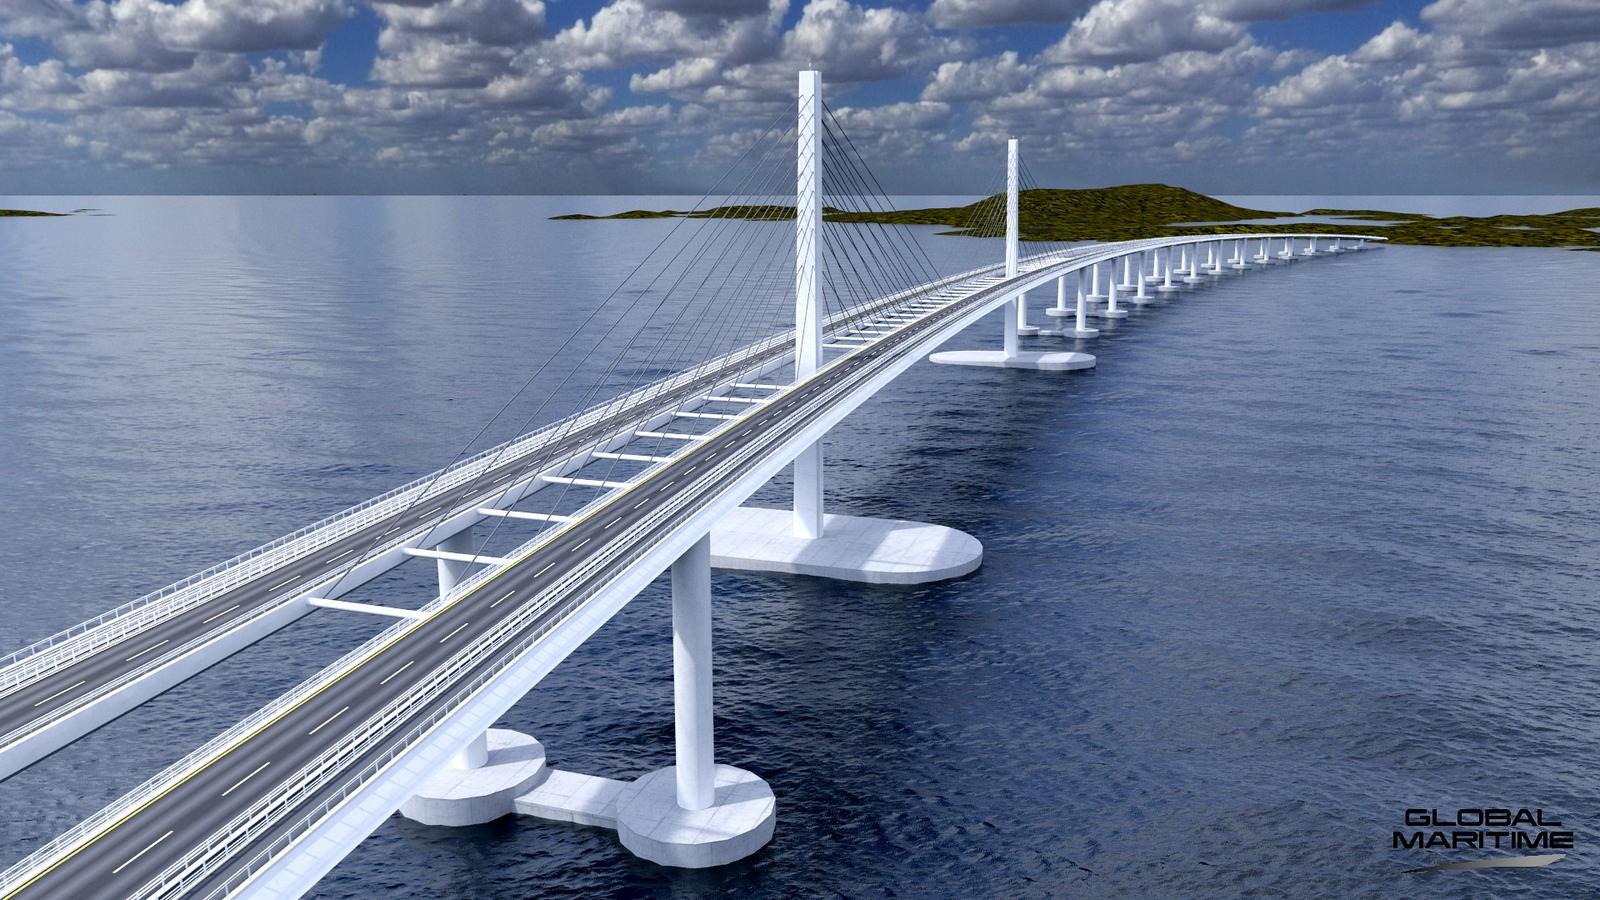 Men den finst andre alternativ også. Firmaet Global Maritime har dette forslaget for ei flytebru på E39 over Bjørnafjorden.